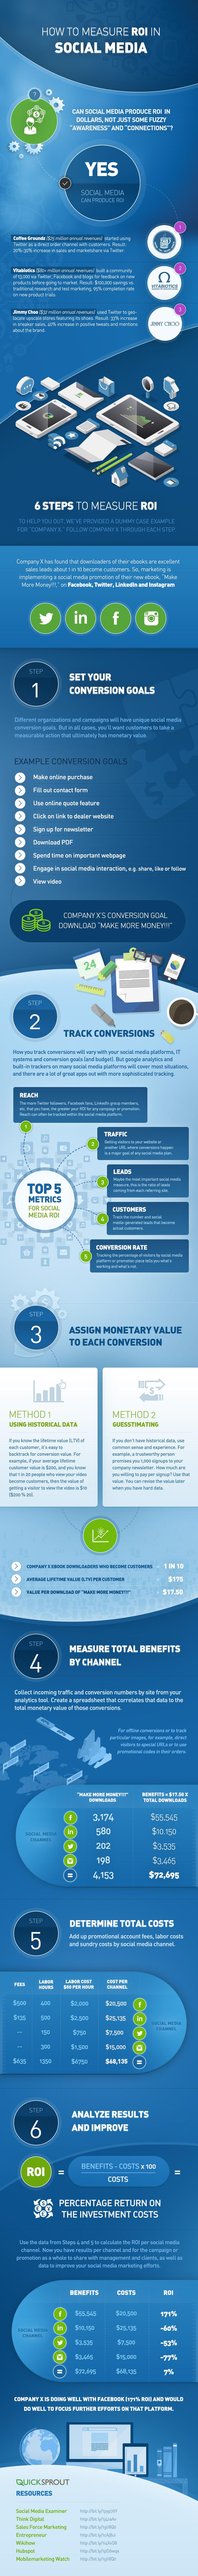 social-media-ROI-infographic